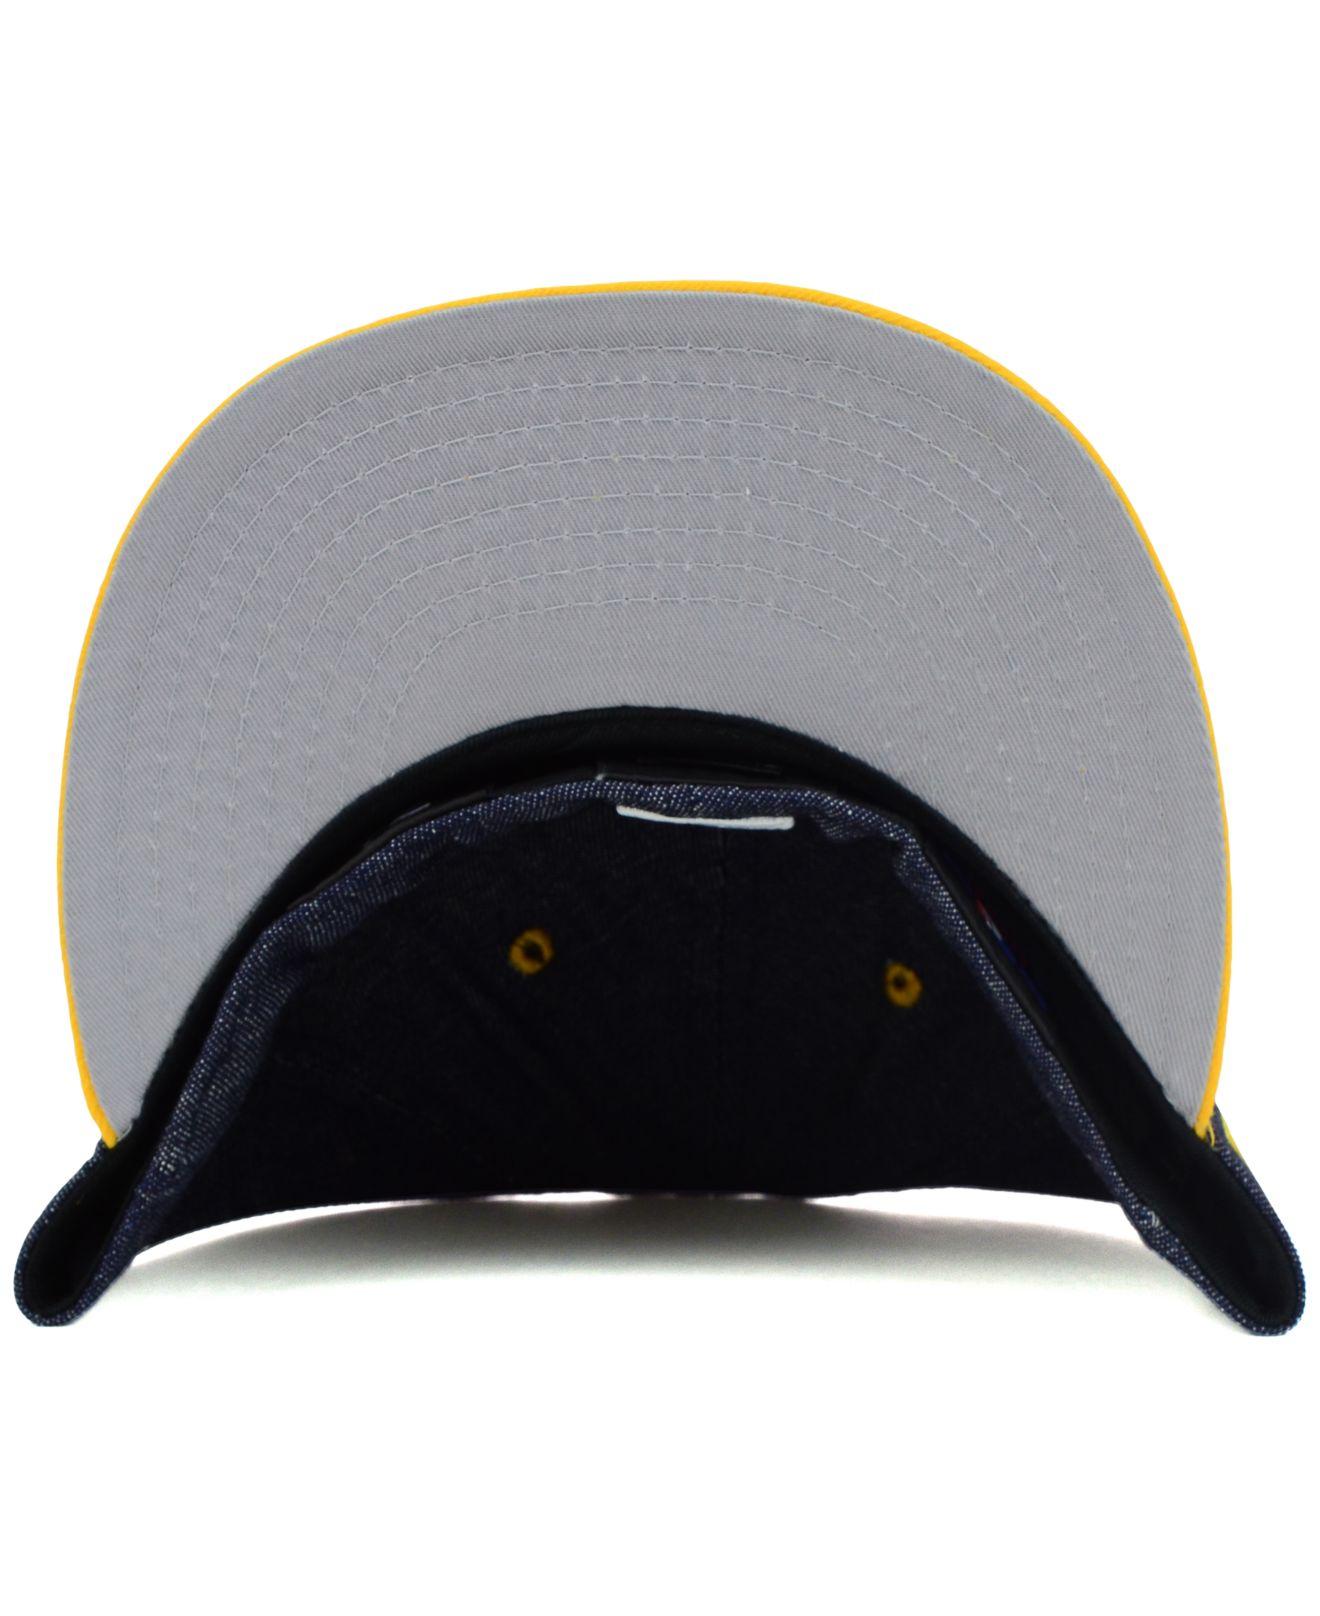 wholesale dealer 3f4d3 935db Lyst - KTZ Pittsburgh Pirates Mlb Team Color Denim 59fifty Cap in ...